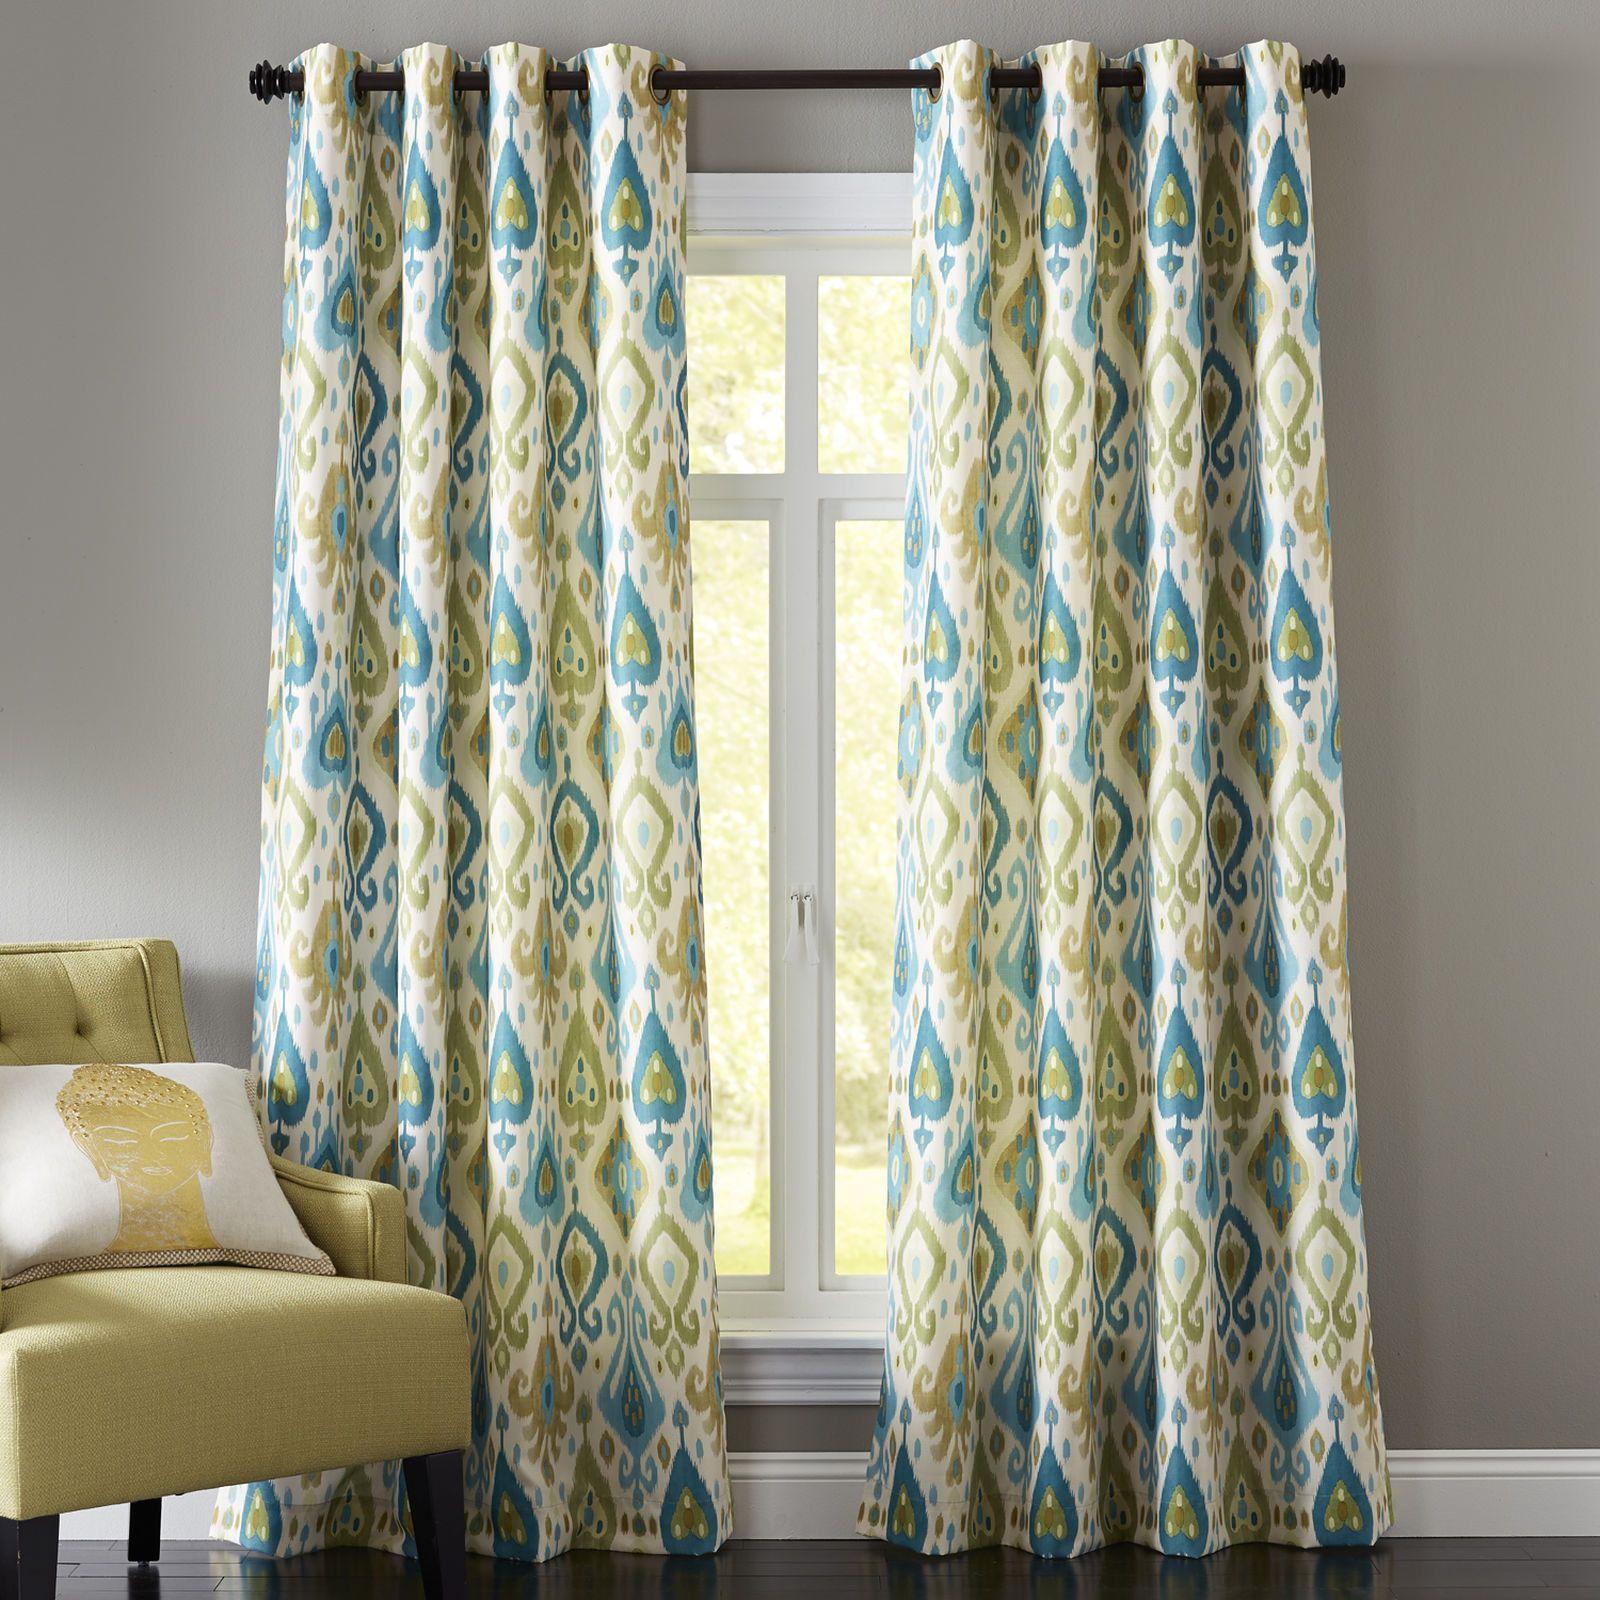 Ikat curtain panels - Ikat Curtain Blue Green Pier 1 Imports